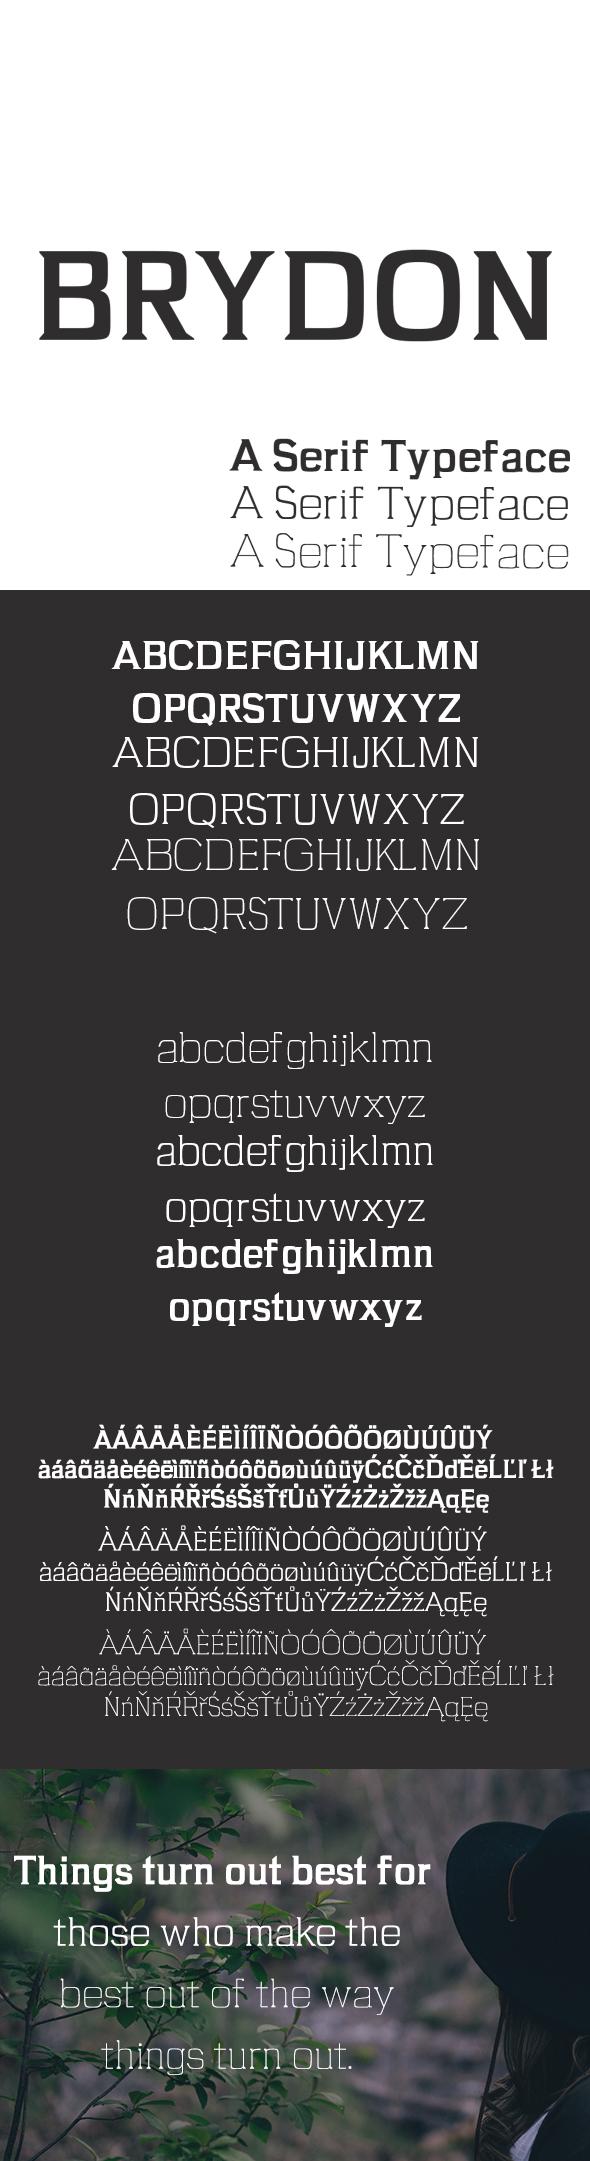 GraphicRiver Brydon Serif Typeface 20492097